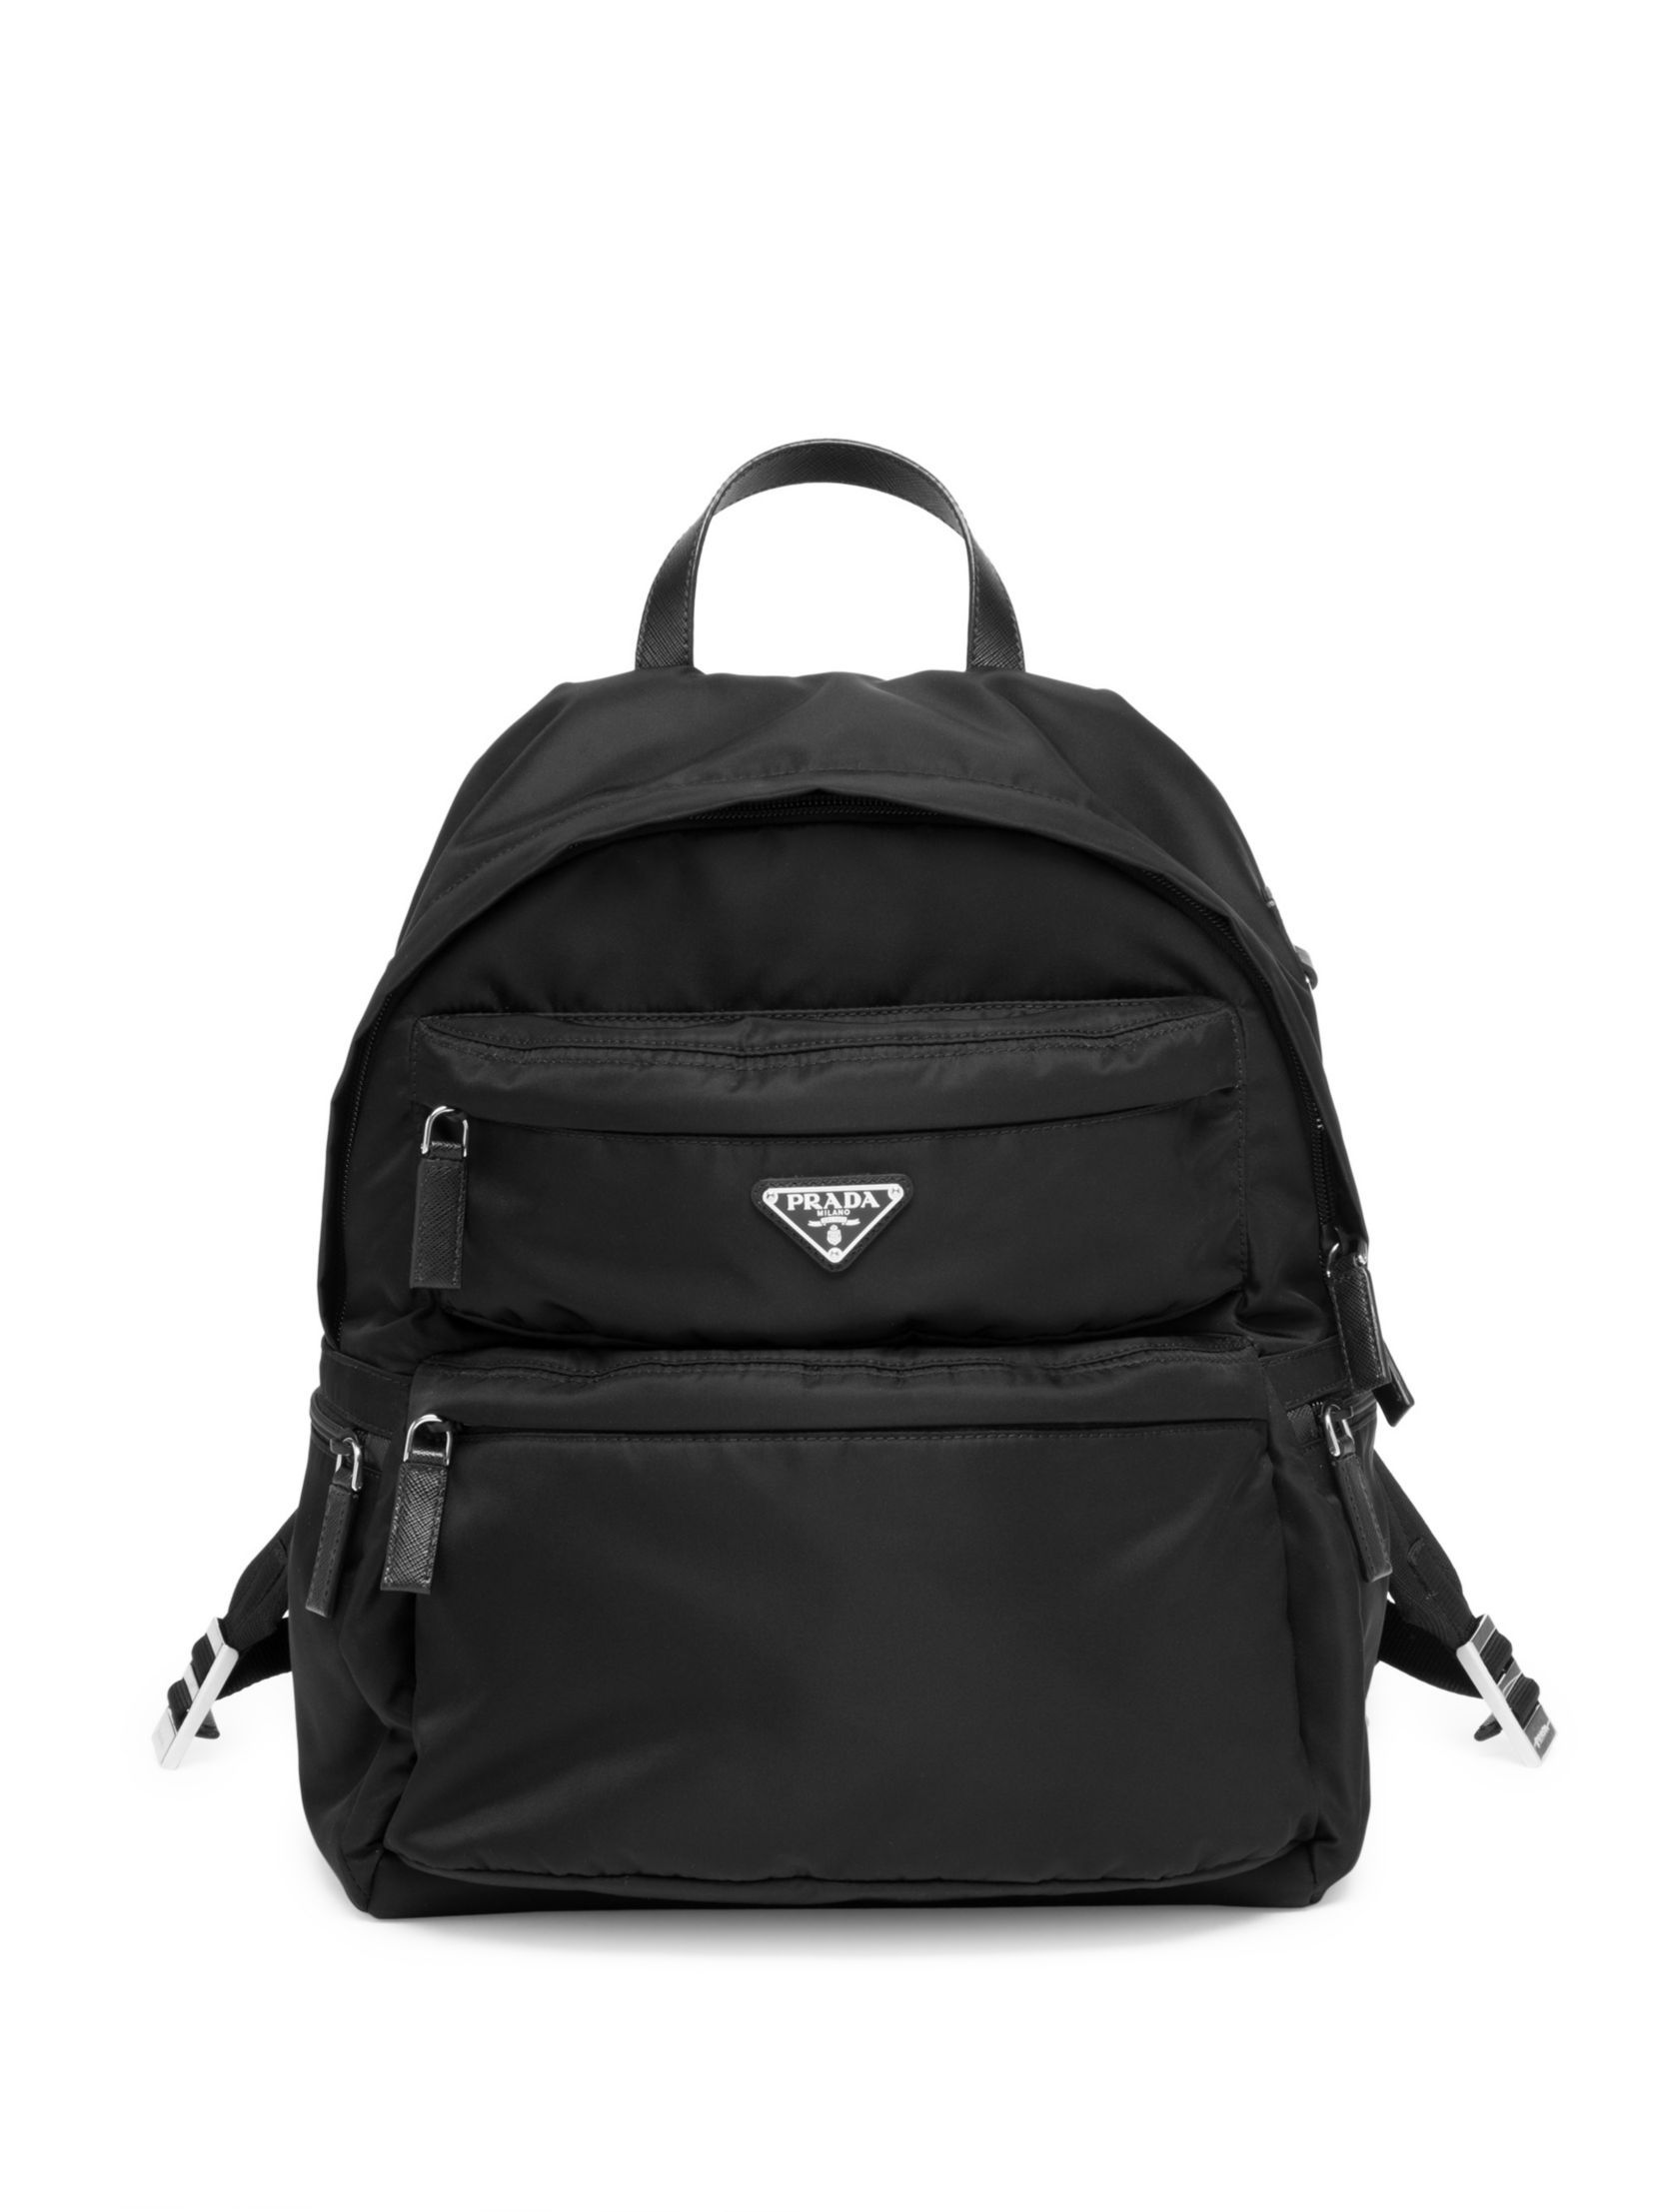 df6535390654 Prada Tessuto Montagna Backpack Saks Fifth Avenue Sale, Men's Backpack,  Black Backpack, Prada